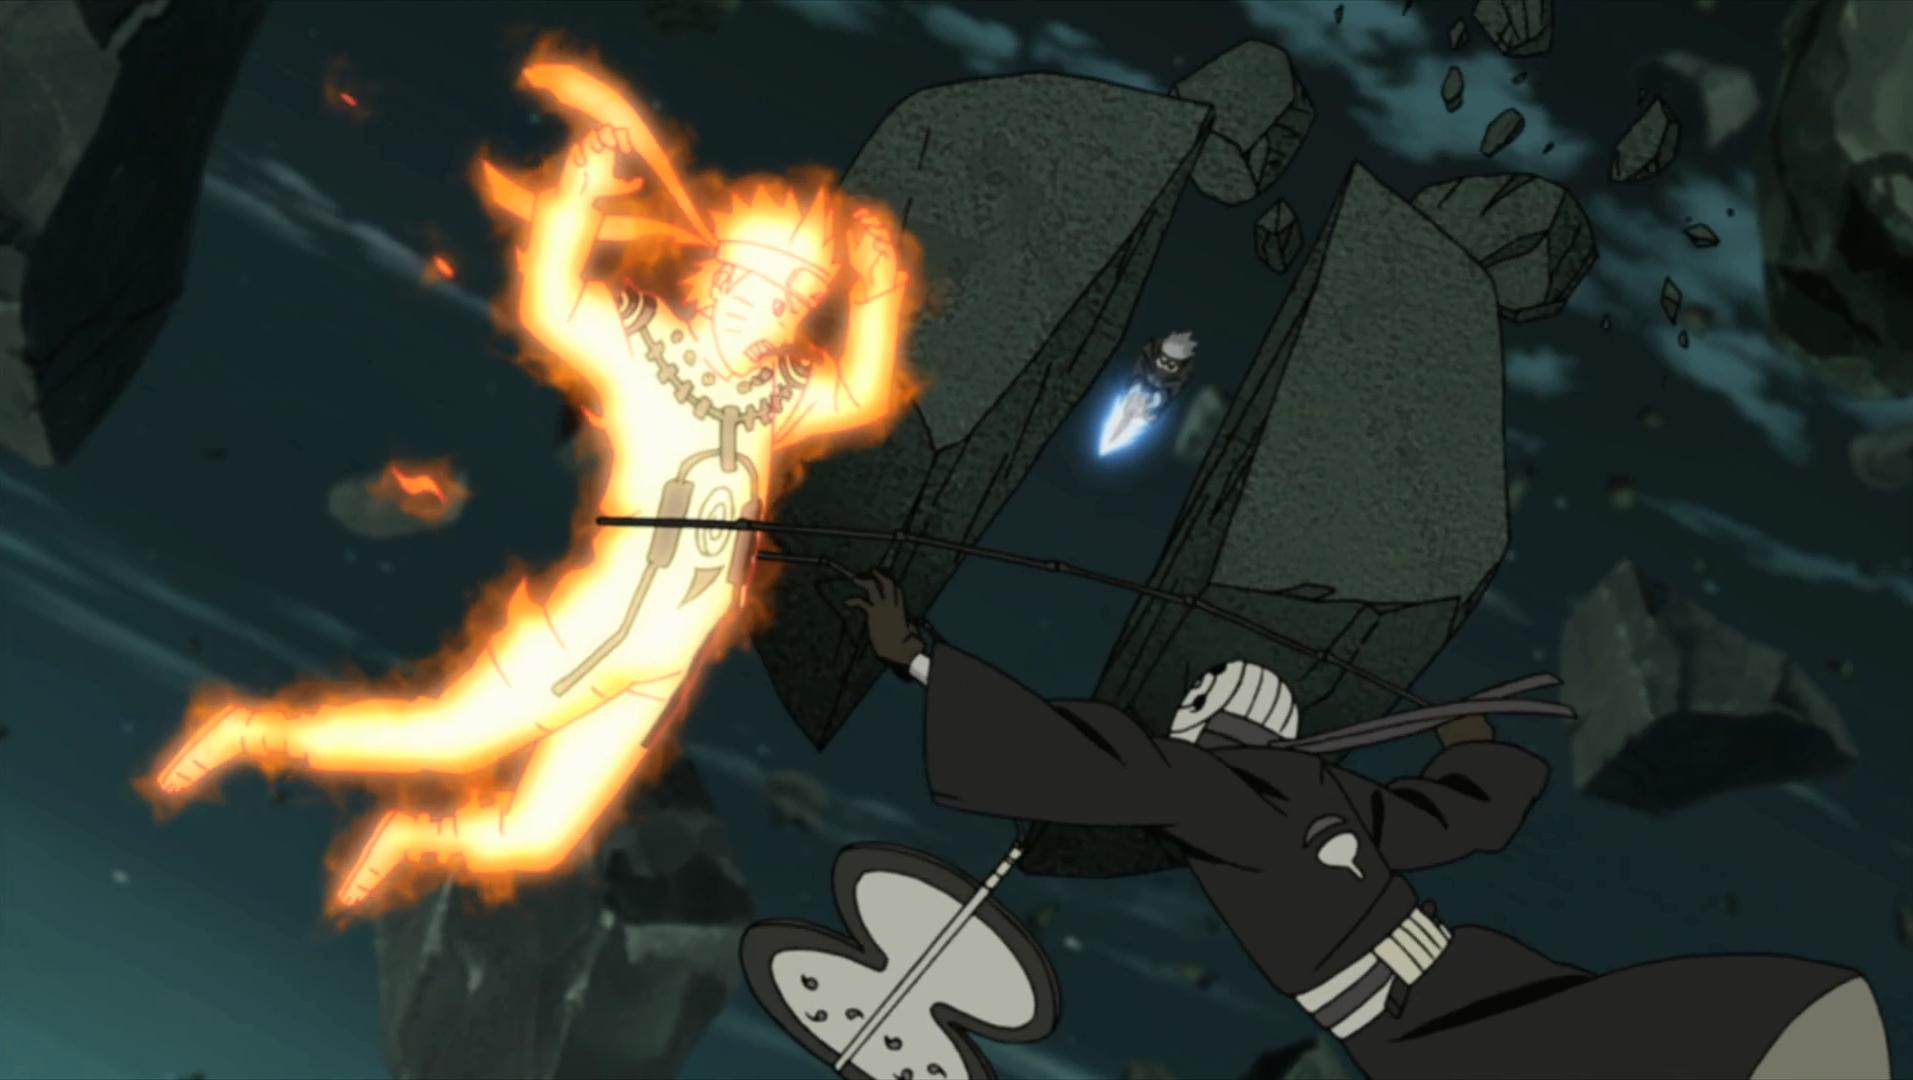 Batman Vs Superman Animasi Bergerak Naruto Kyubi Vs Sasuke Devil Images